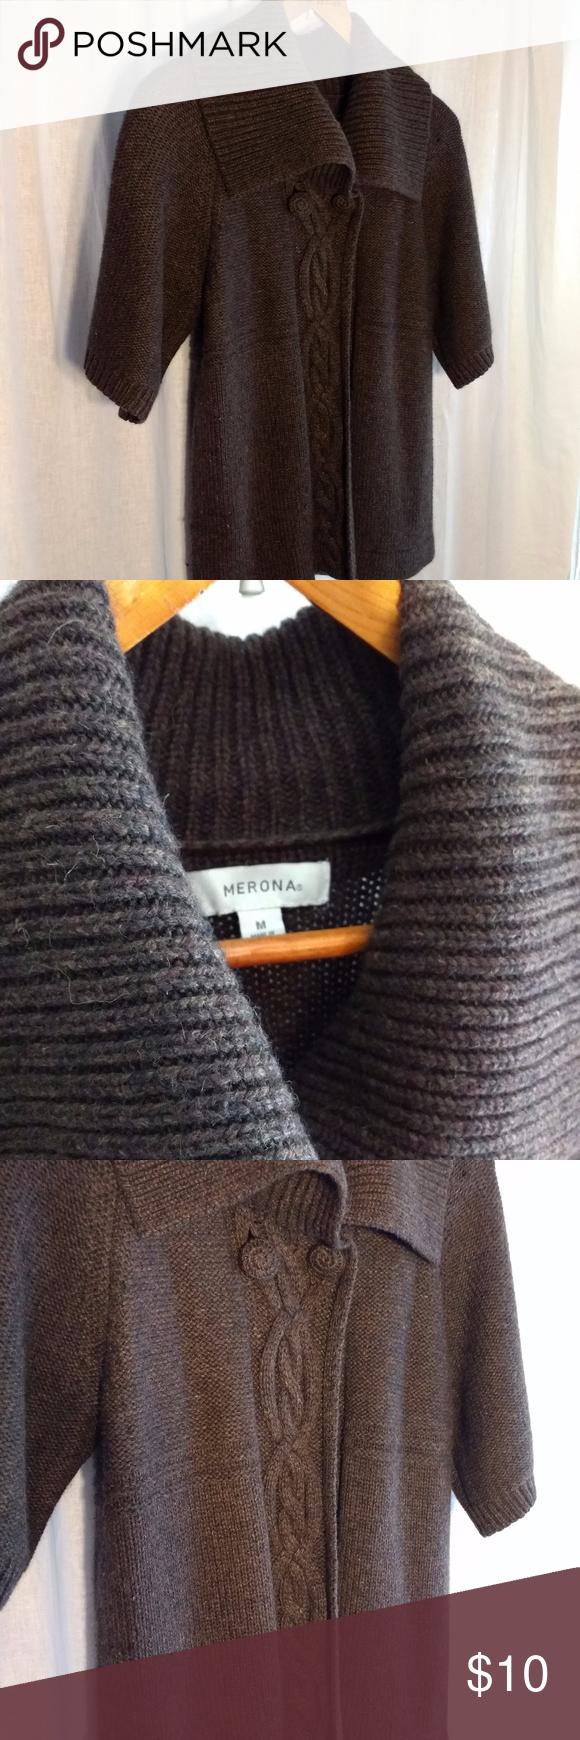 Merona Brown Short Sleeve Sweater sz MD | Brown shorts, Short ...